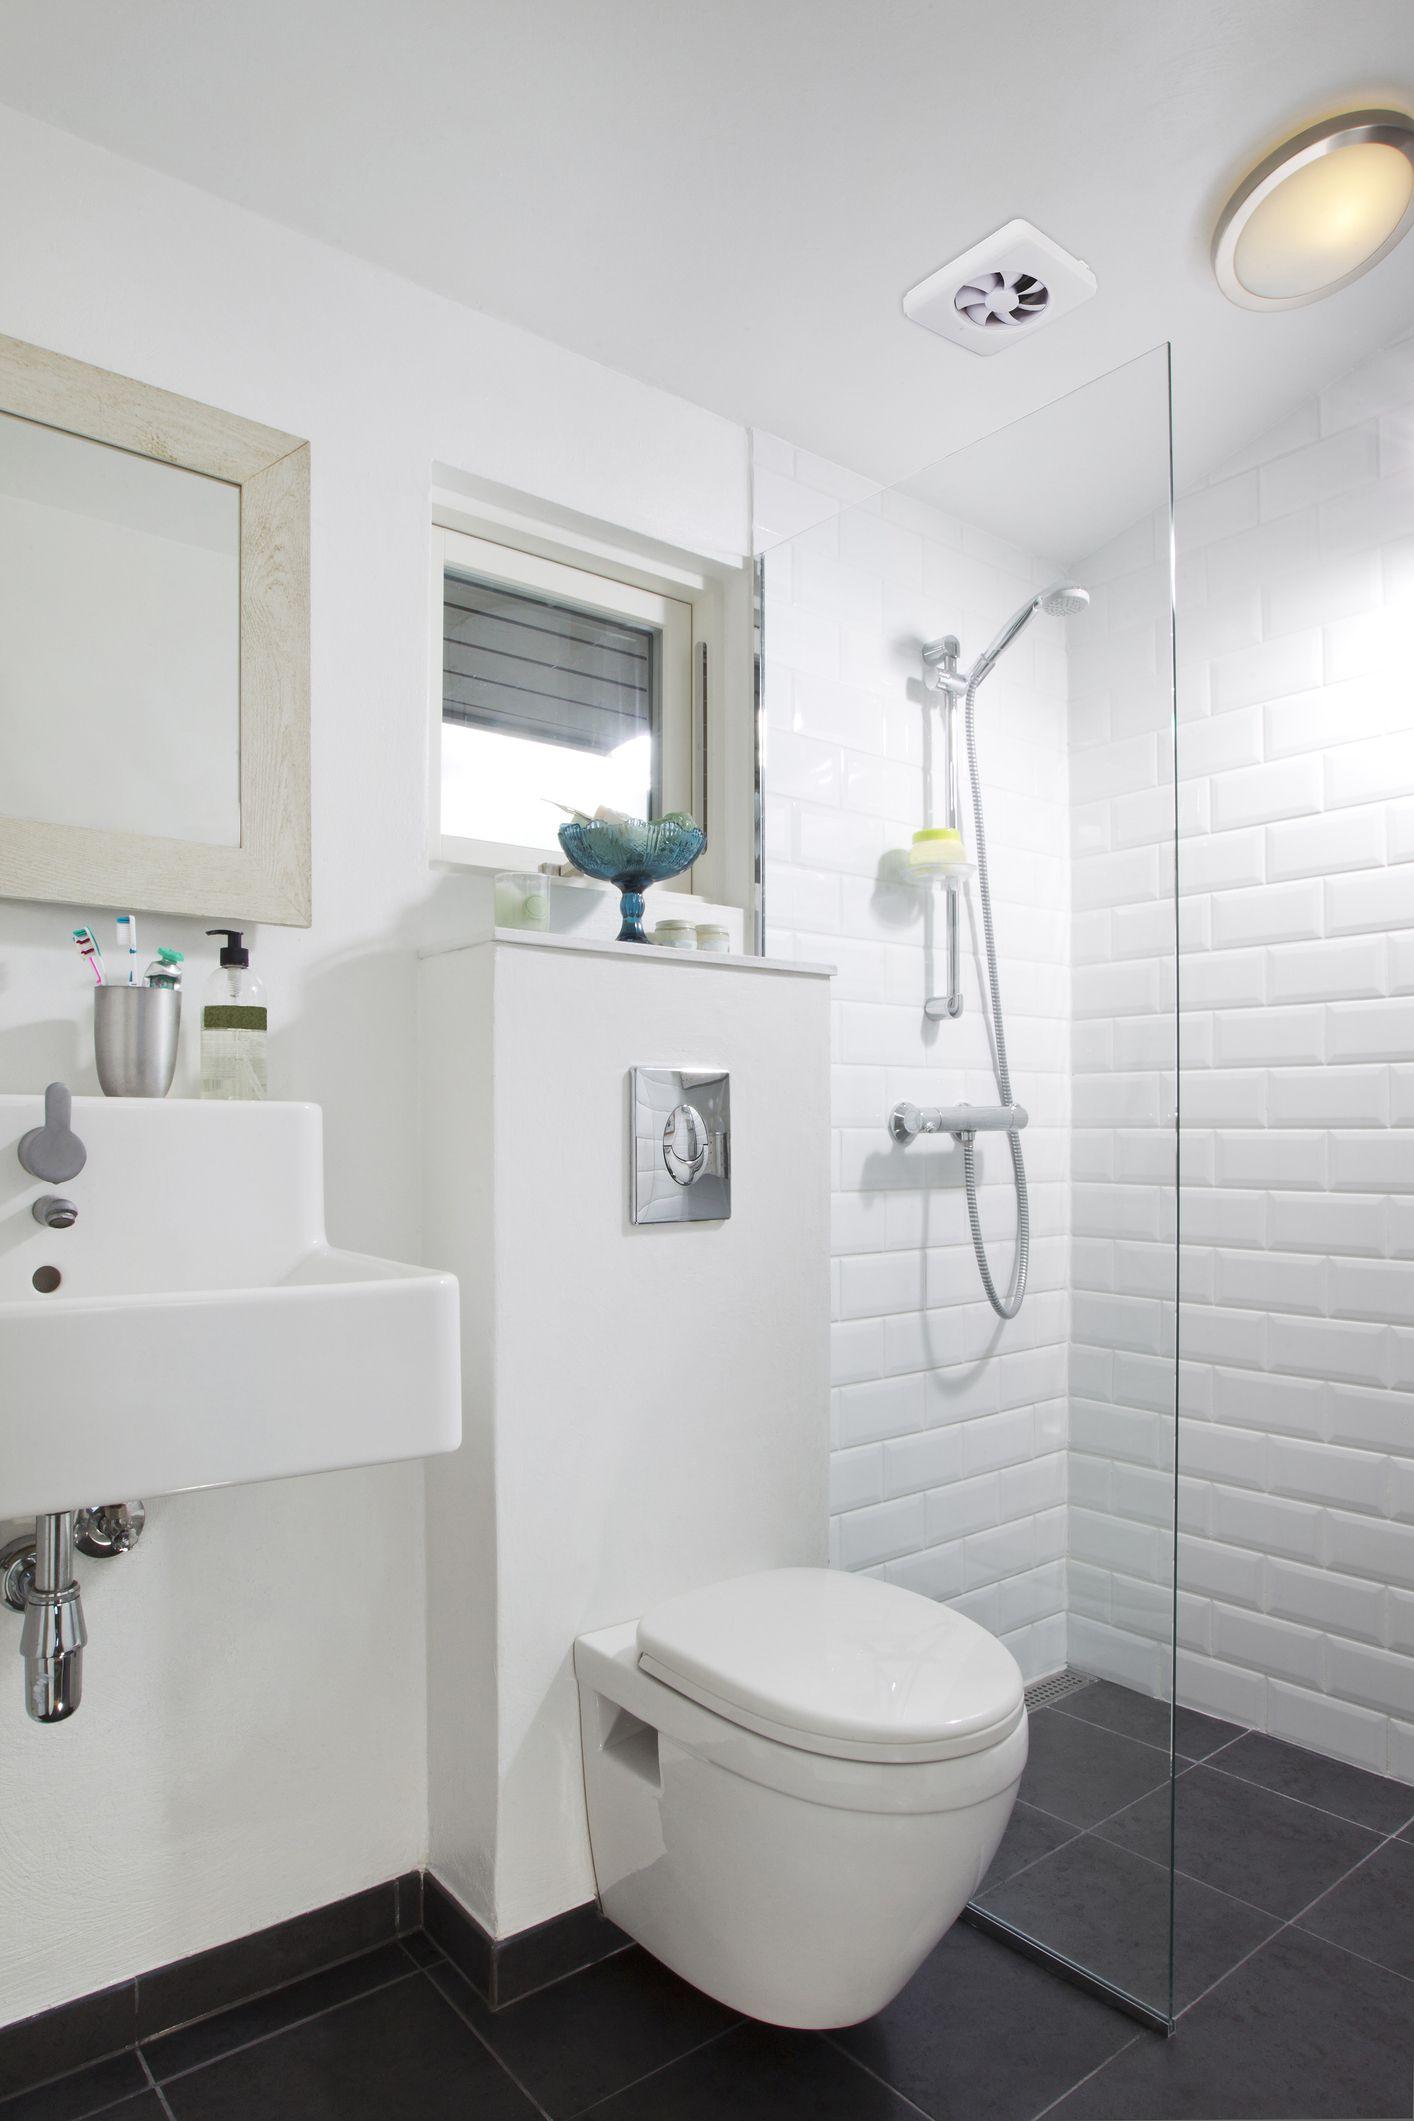 How To Install A Bathroom Exhaust Fan, Best Bathroom Ventilation Fan